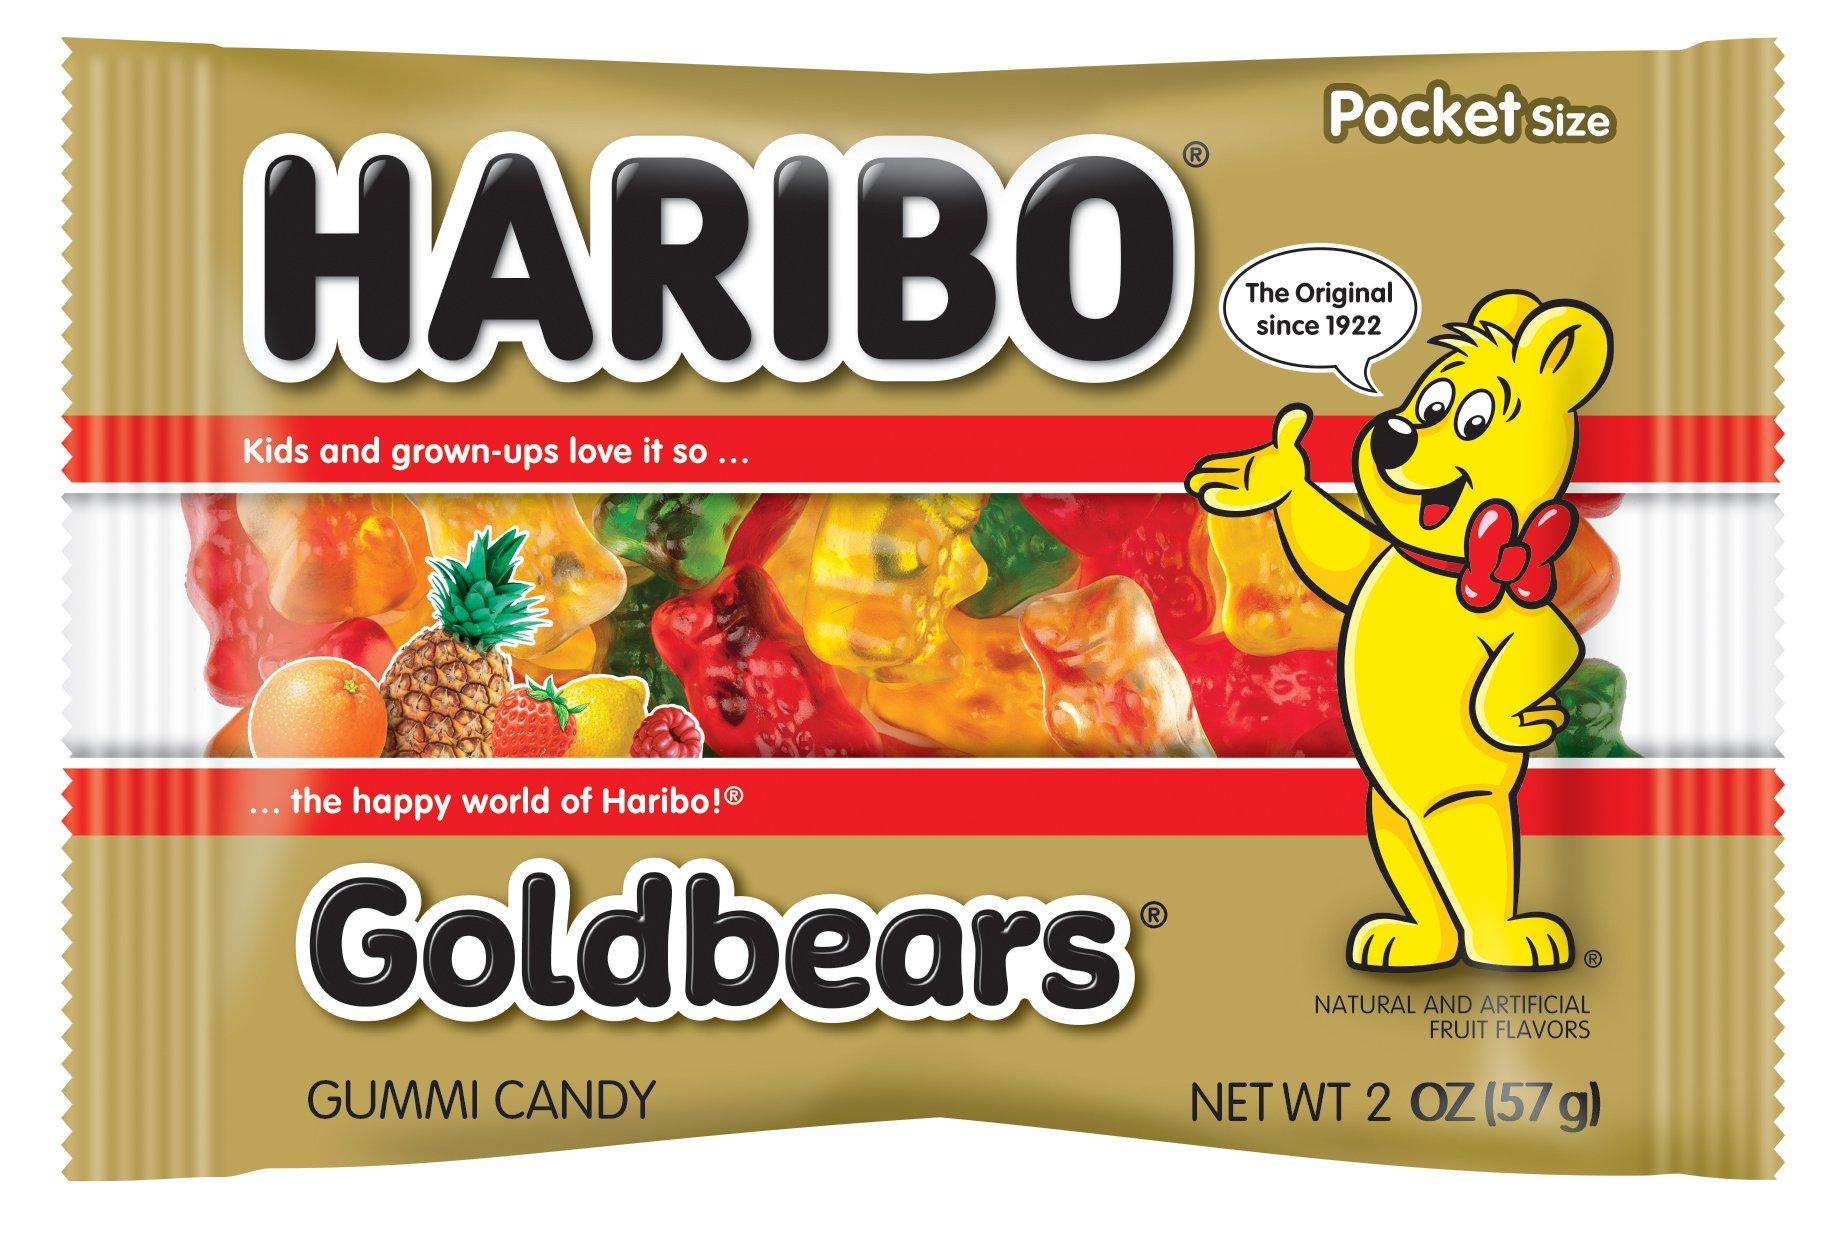 Haribo Gummi Candy, Goldbears, 2 Ounce,Pack of 4 by Haribo